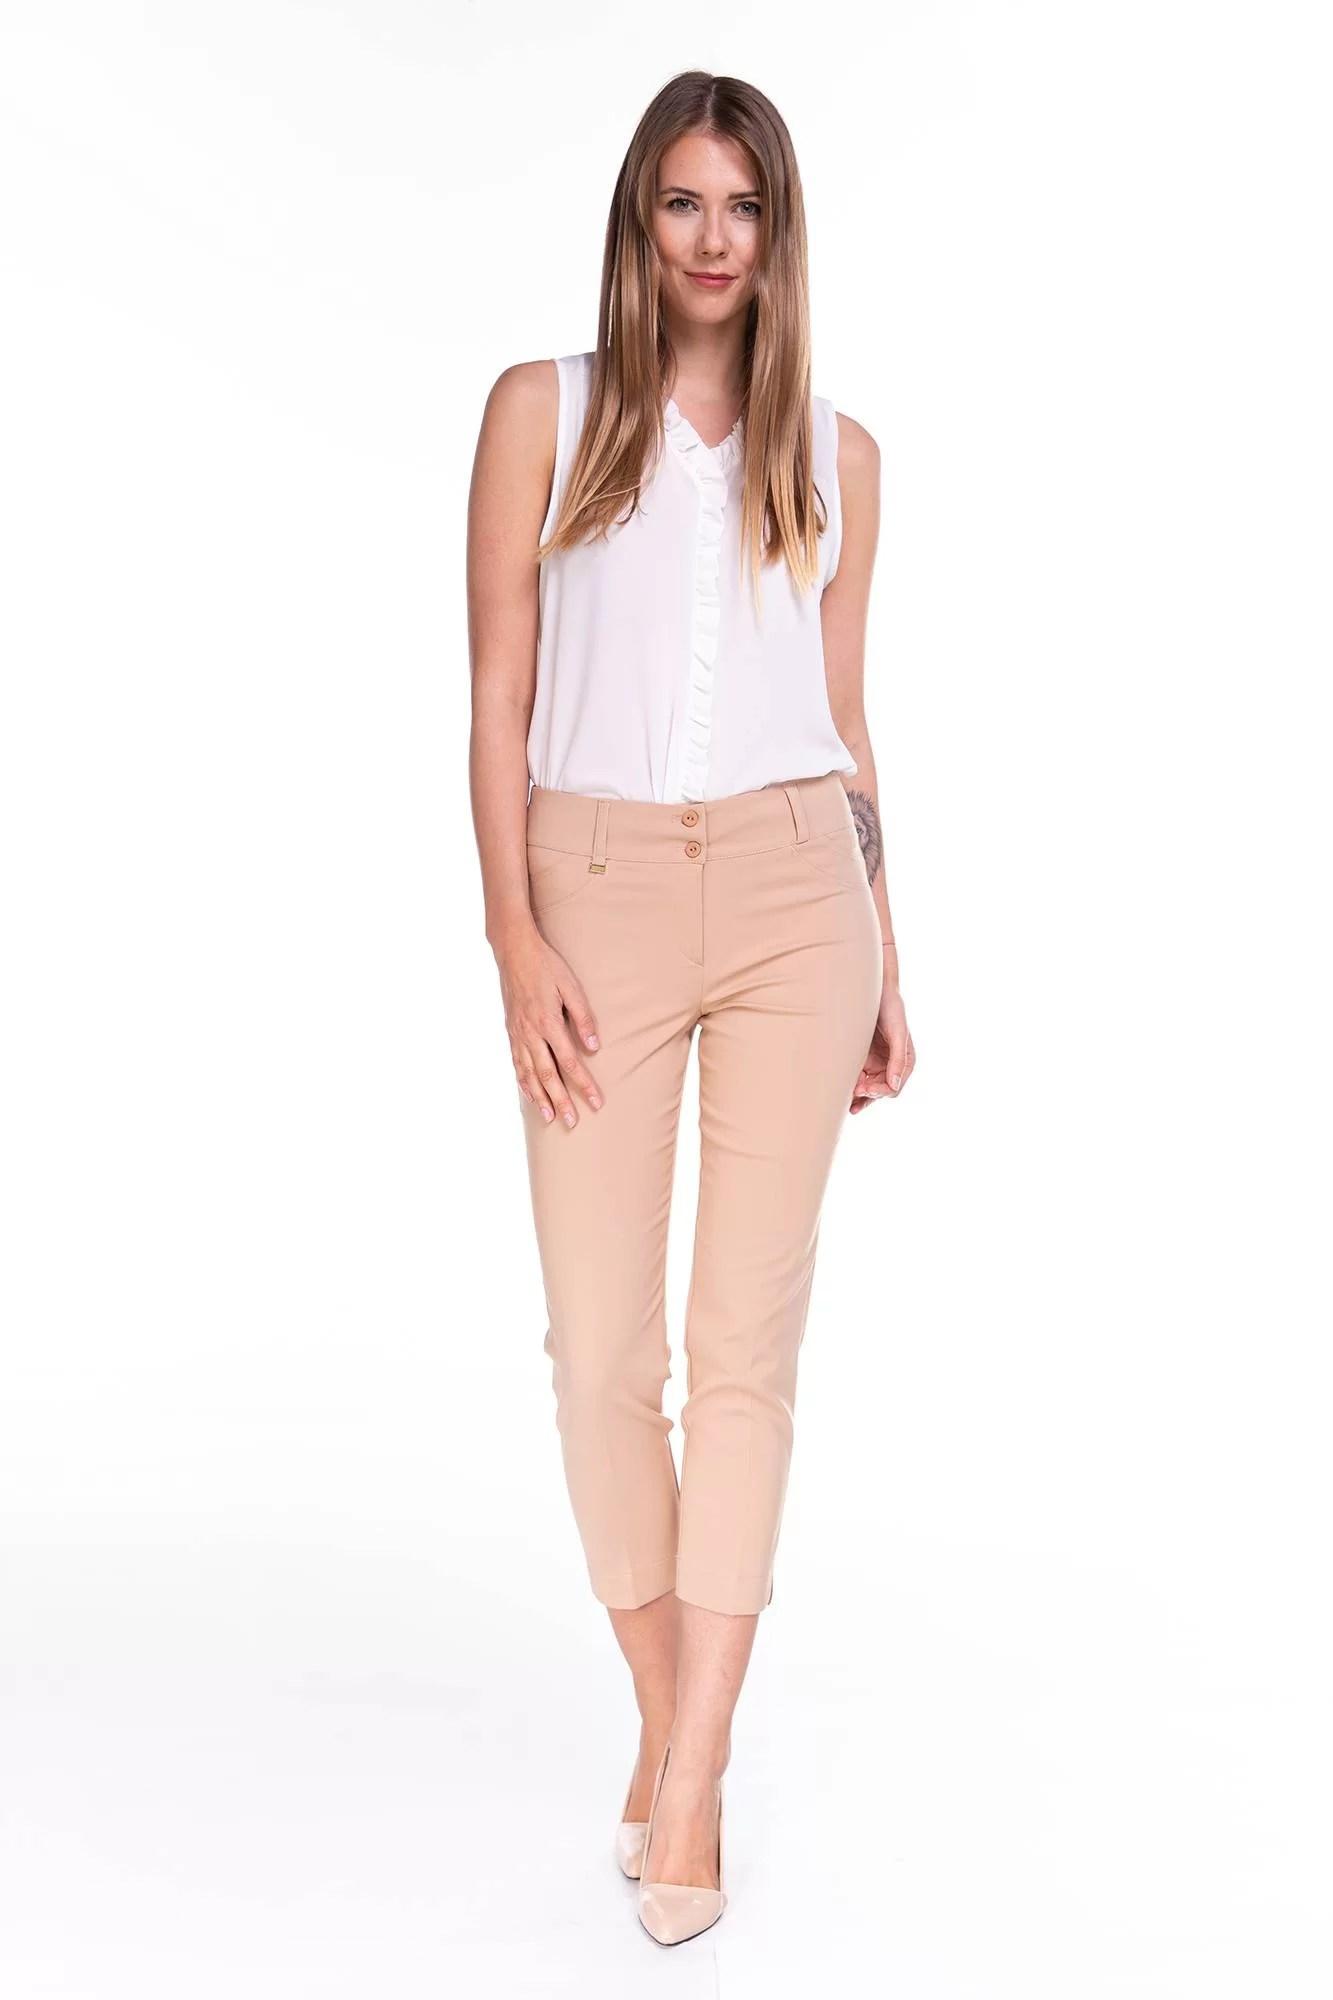 Spodnie Capri Beżowe